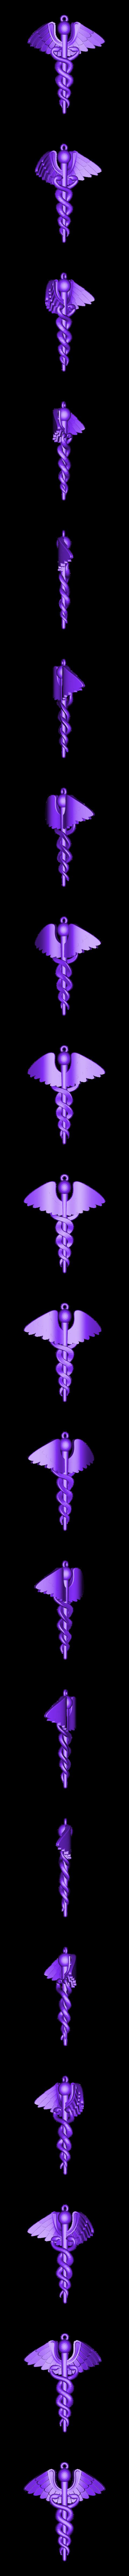 Caduceus_ Final _ Repair_ 01 Dec.stl Download OBJ file Caduceus • 3D printable template, Cadiaan